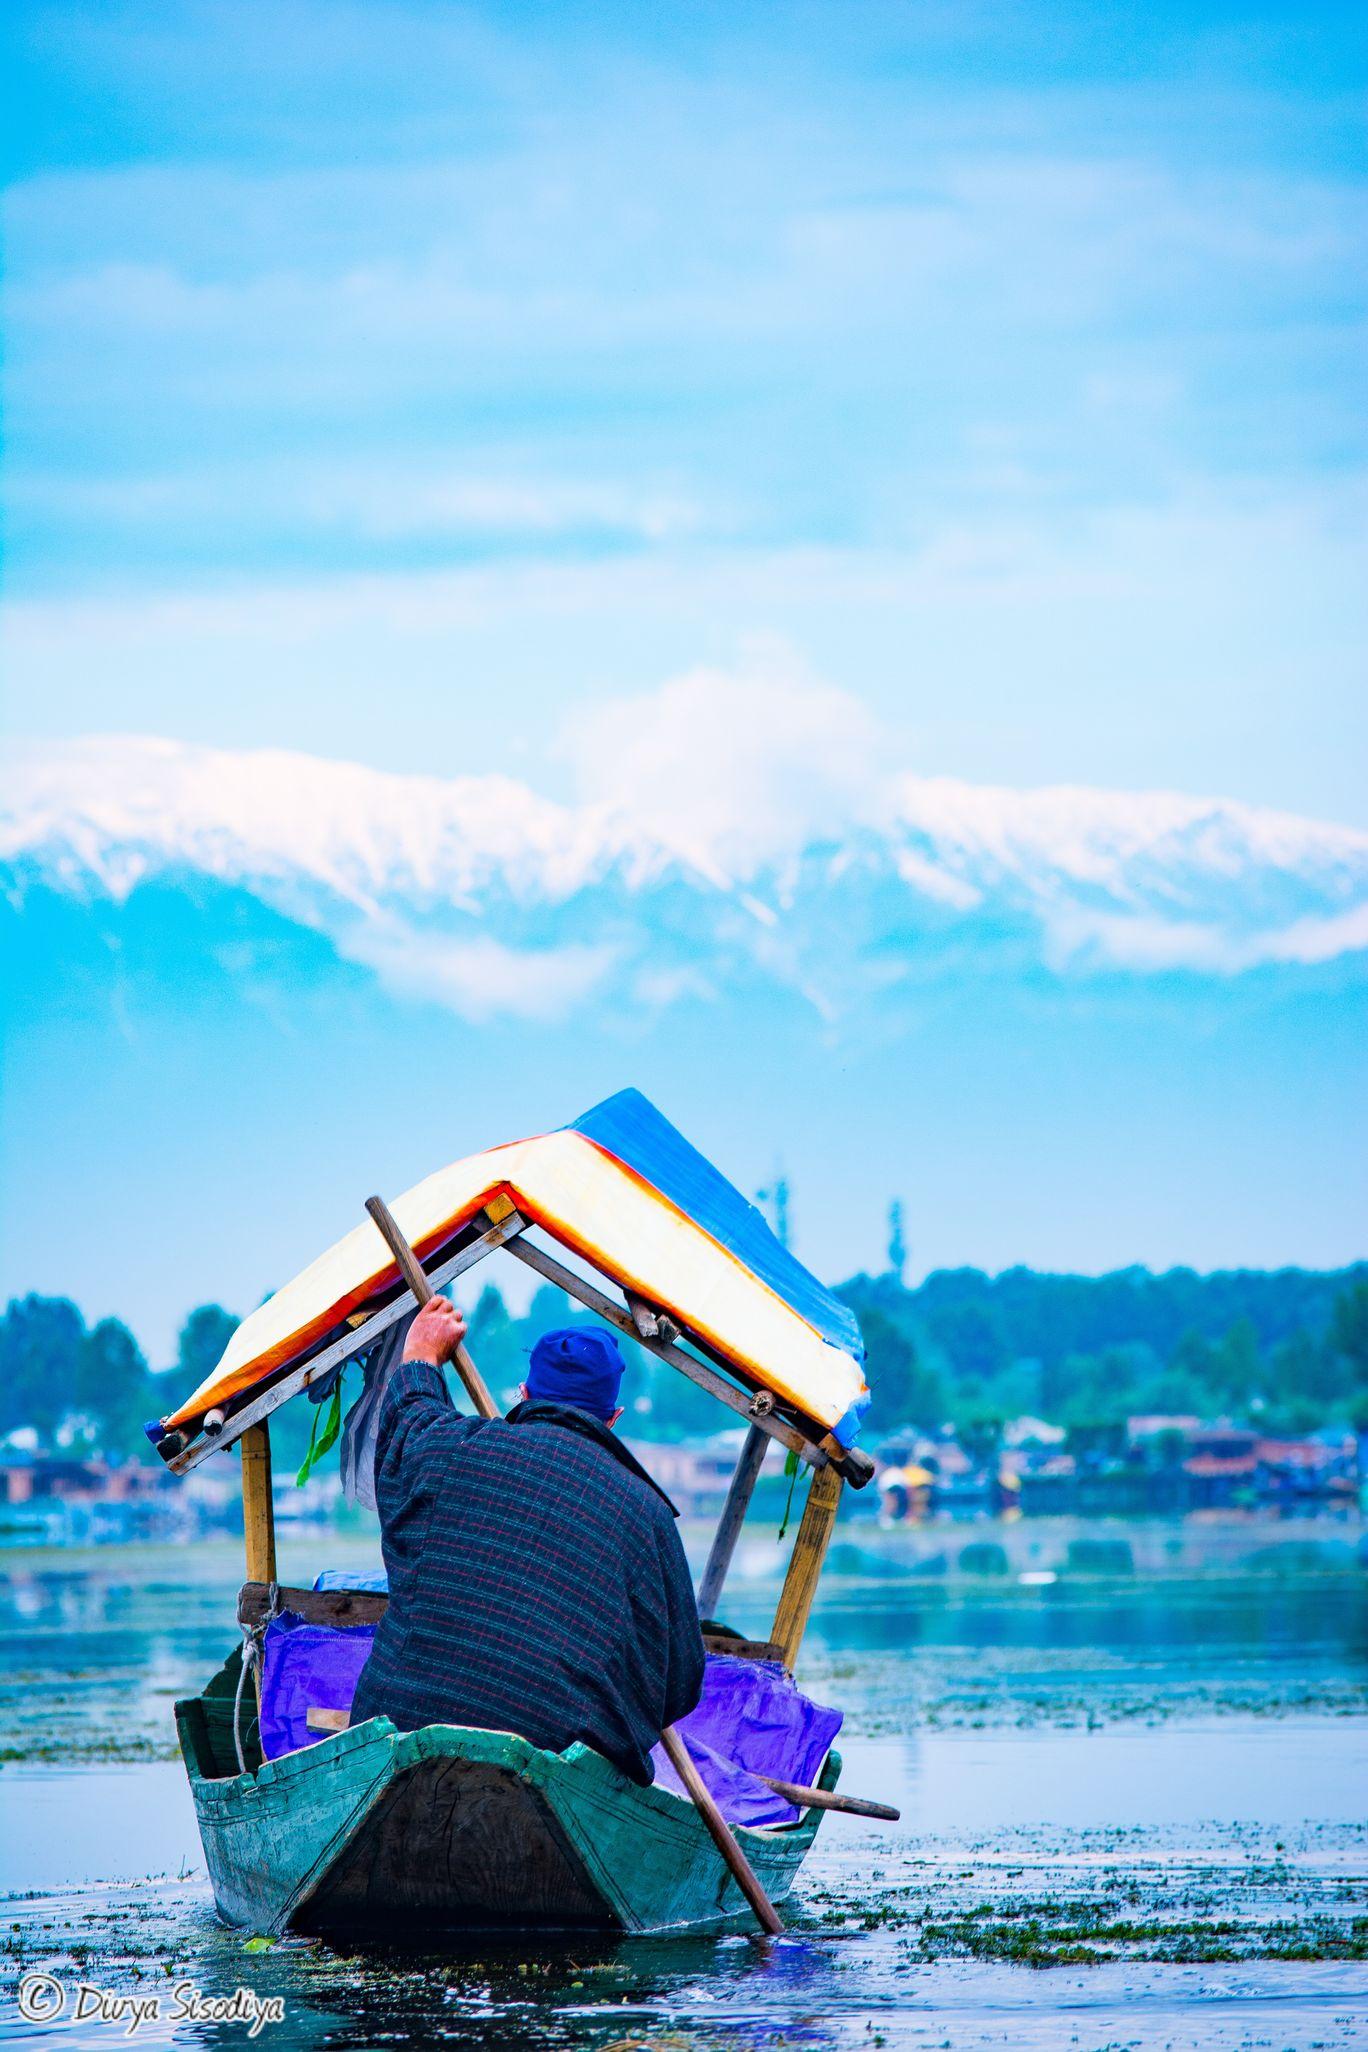 Photo of Dal Lake By Divya Sisodiya